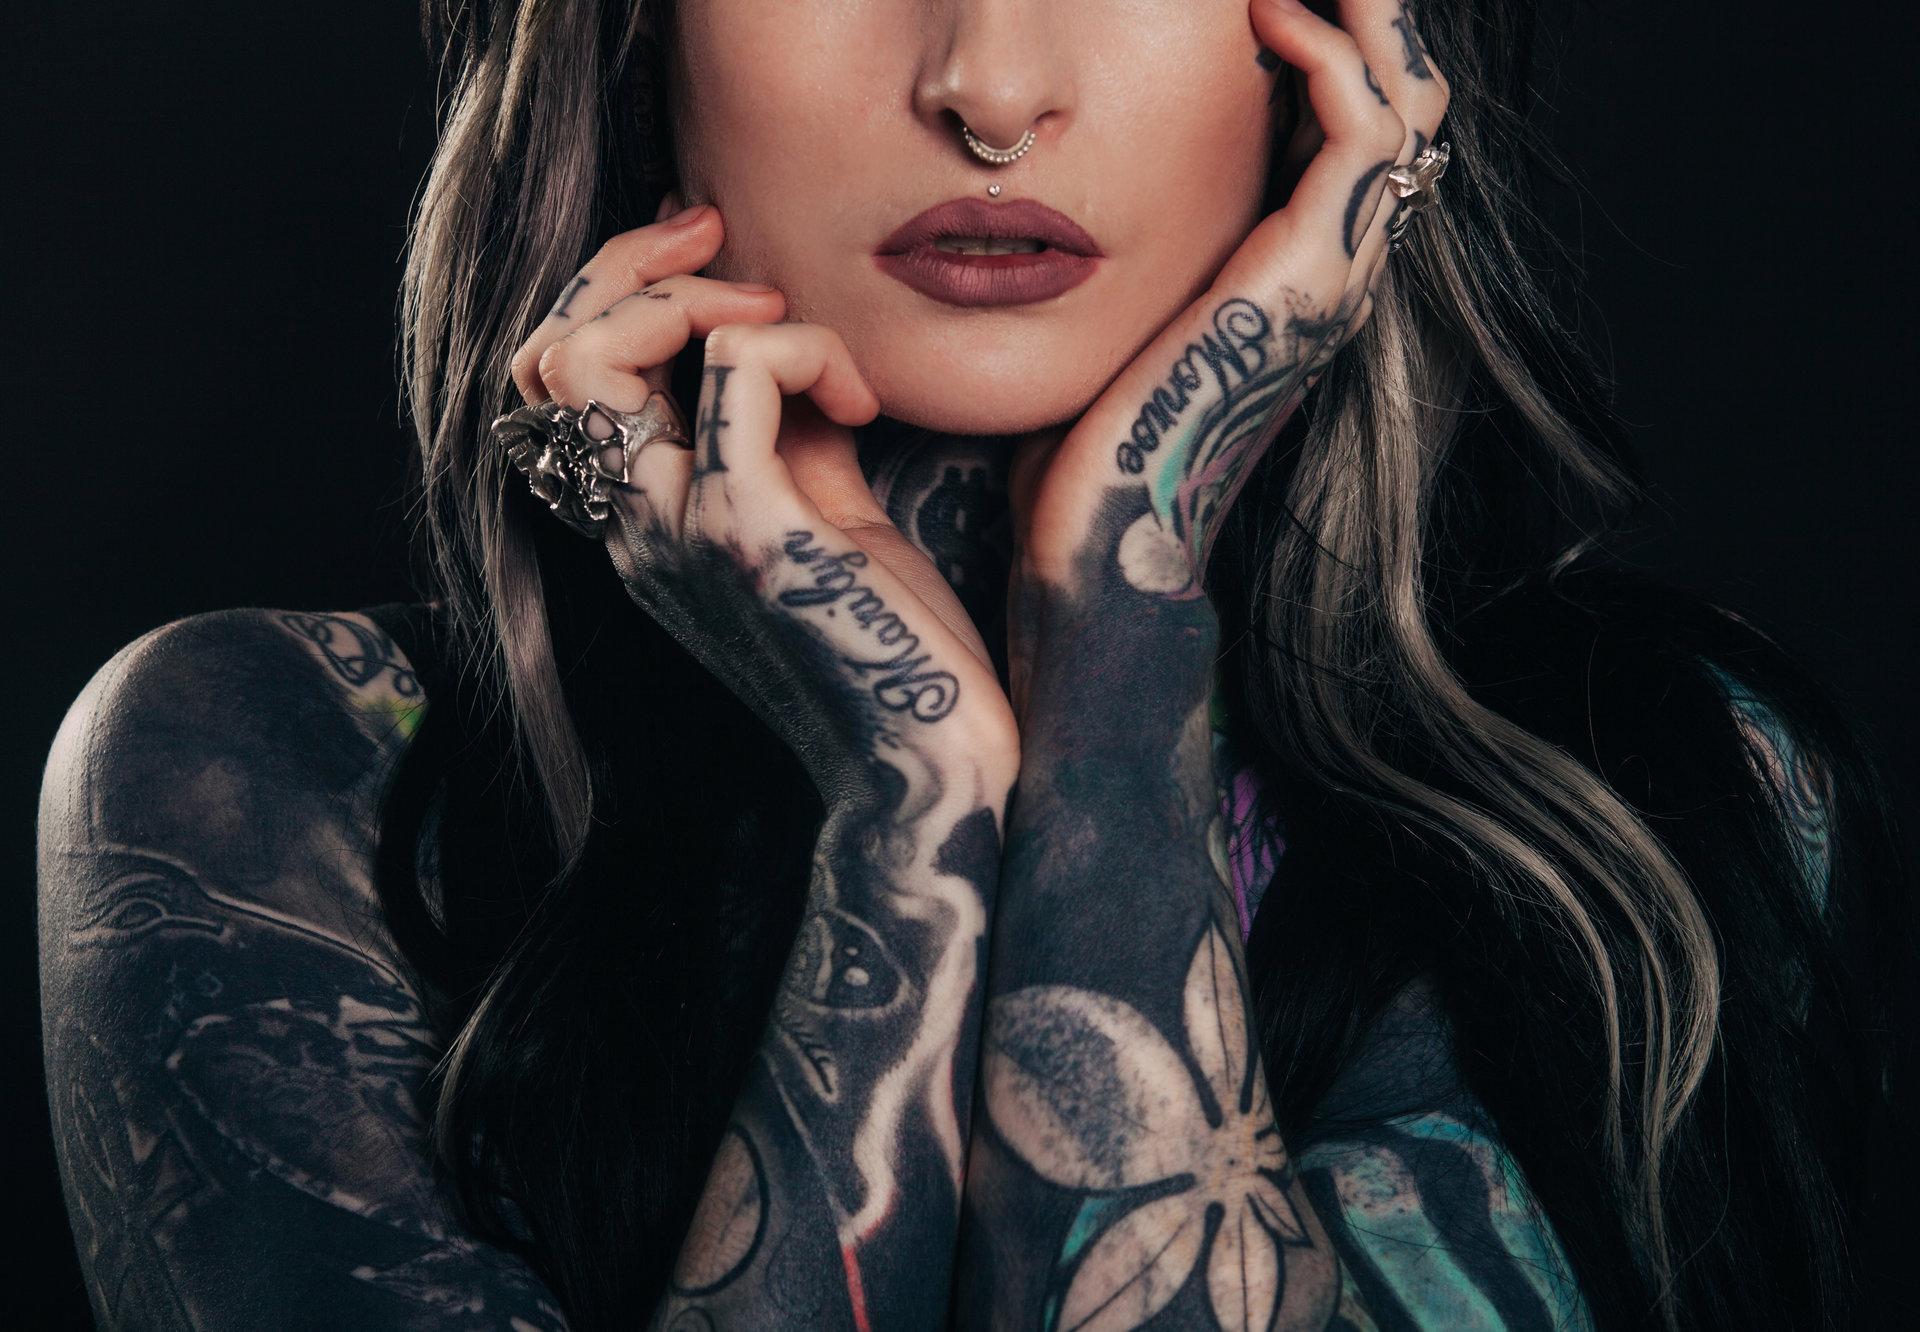 Reprtintic - tatuaż jak nowy